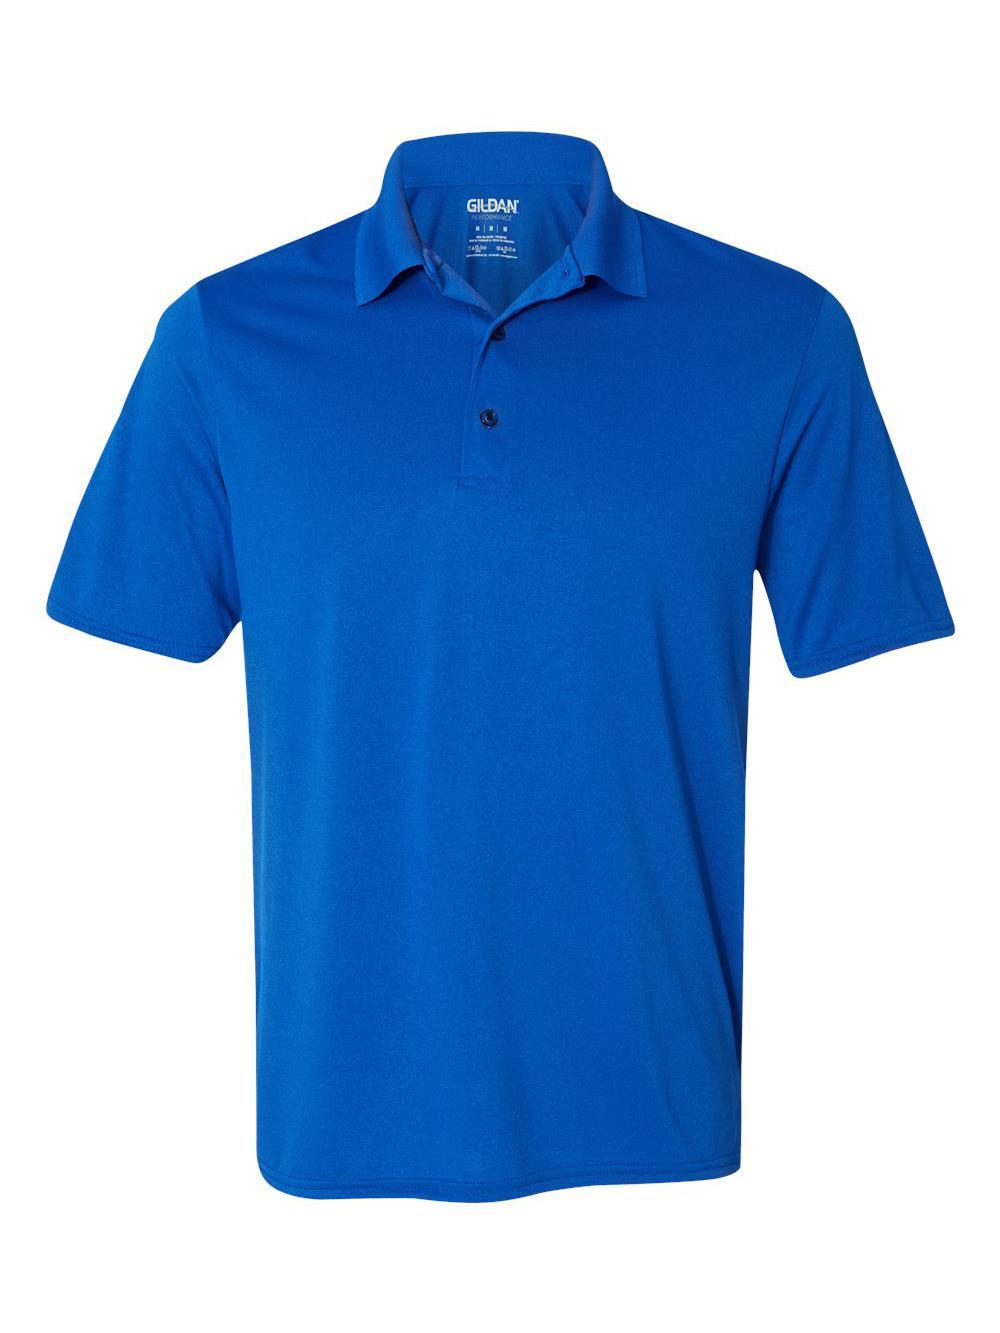 Gildan-Performance-Jersey-Sport-Shirt-44800 thumbnail 18